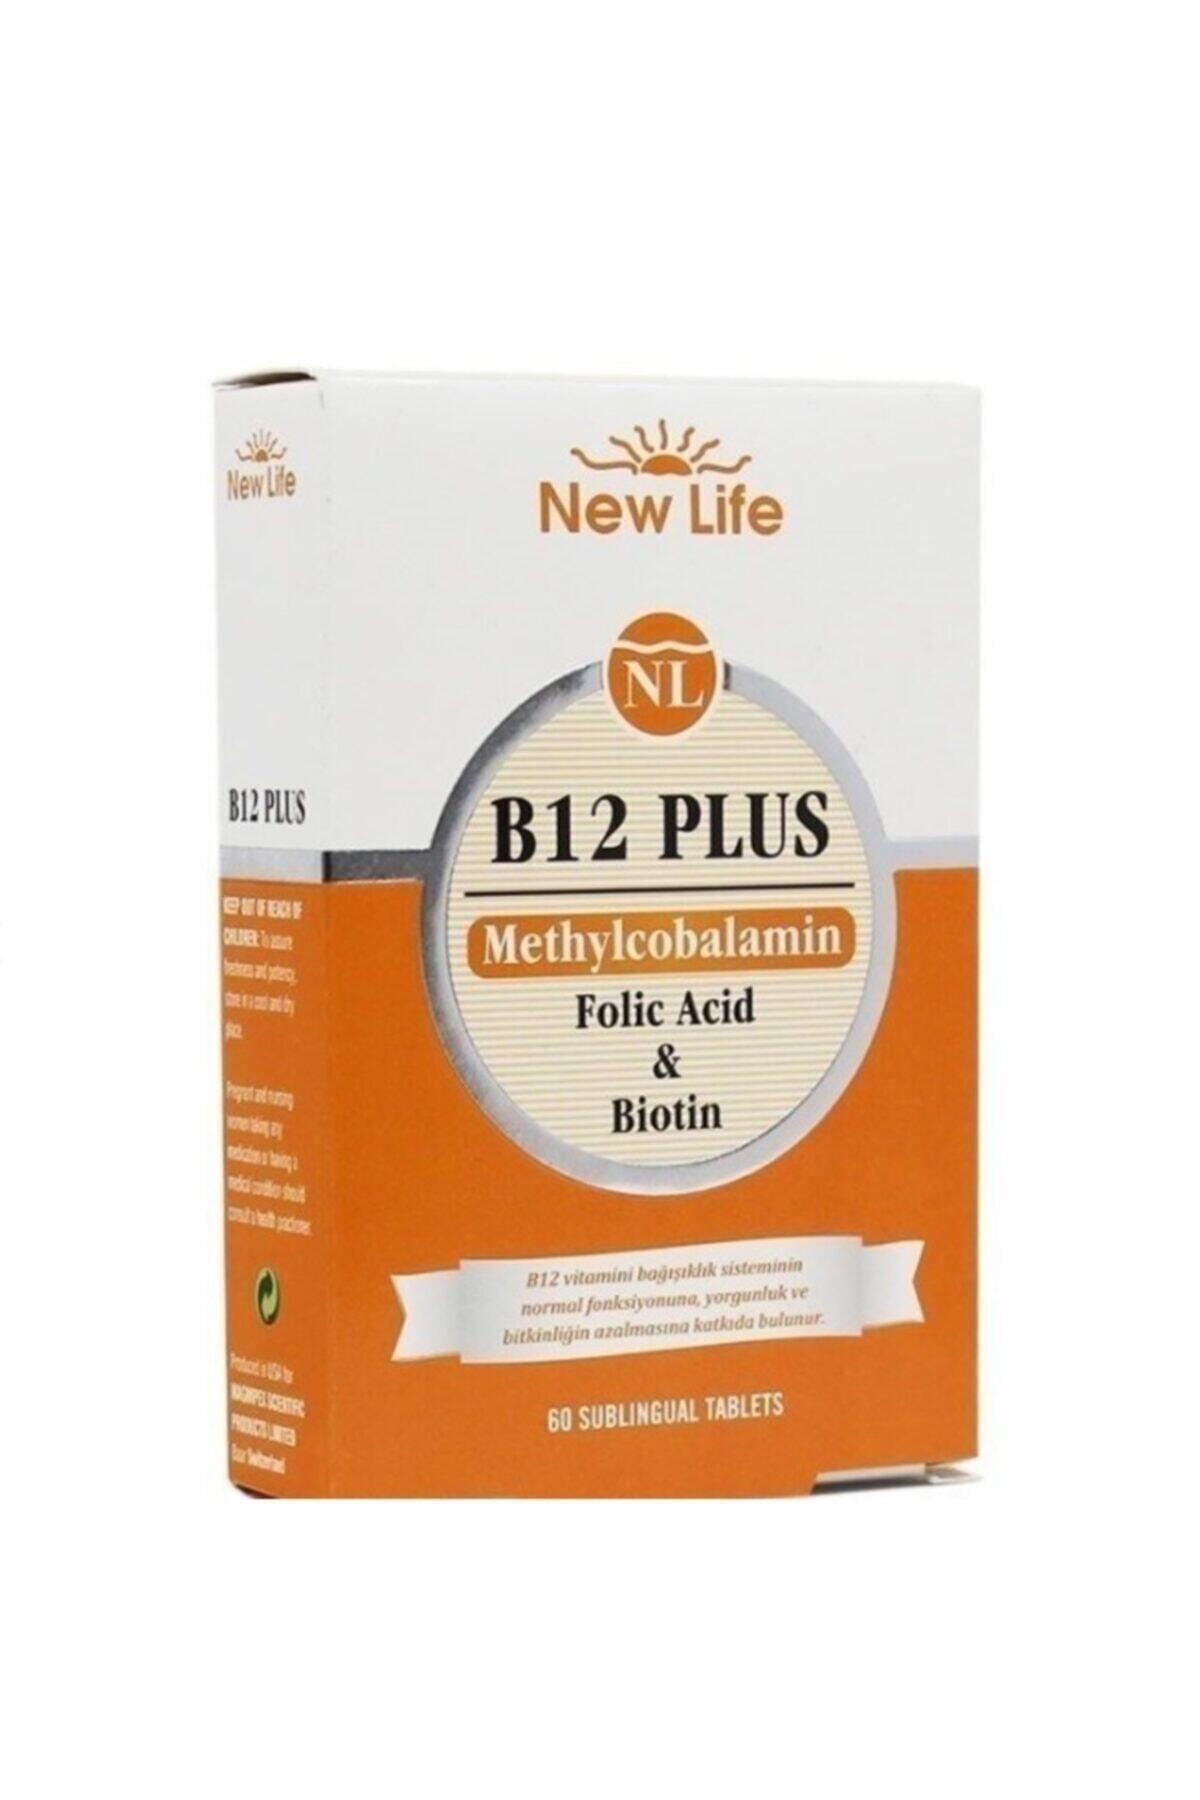 New Life B12 Plus 60 Tablet 2